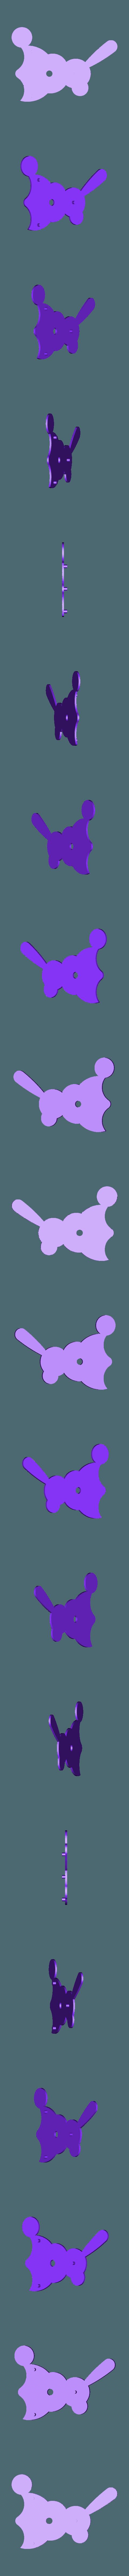 Body_Right_Solid.stl Download free STL file Windup Bunny • 3D printing design, gzumwalt